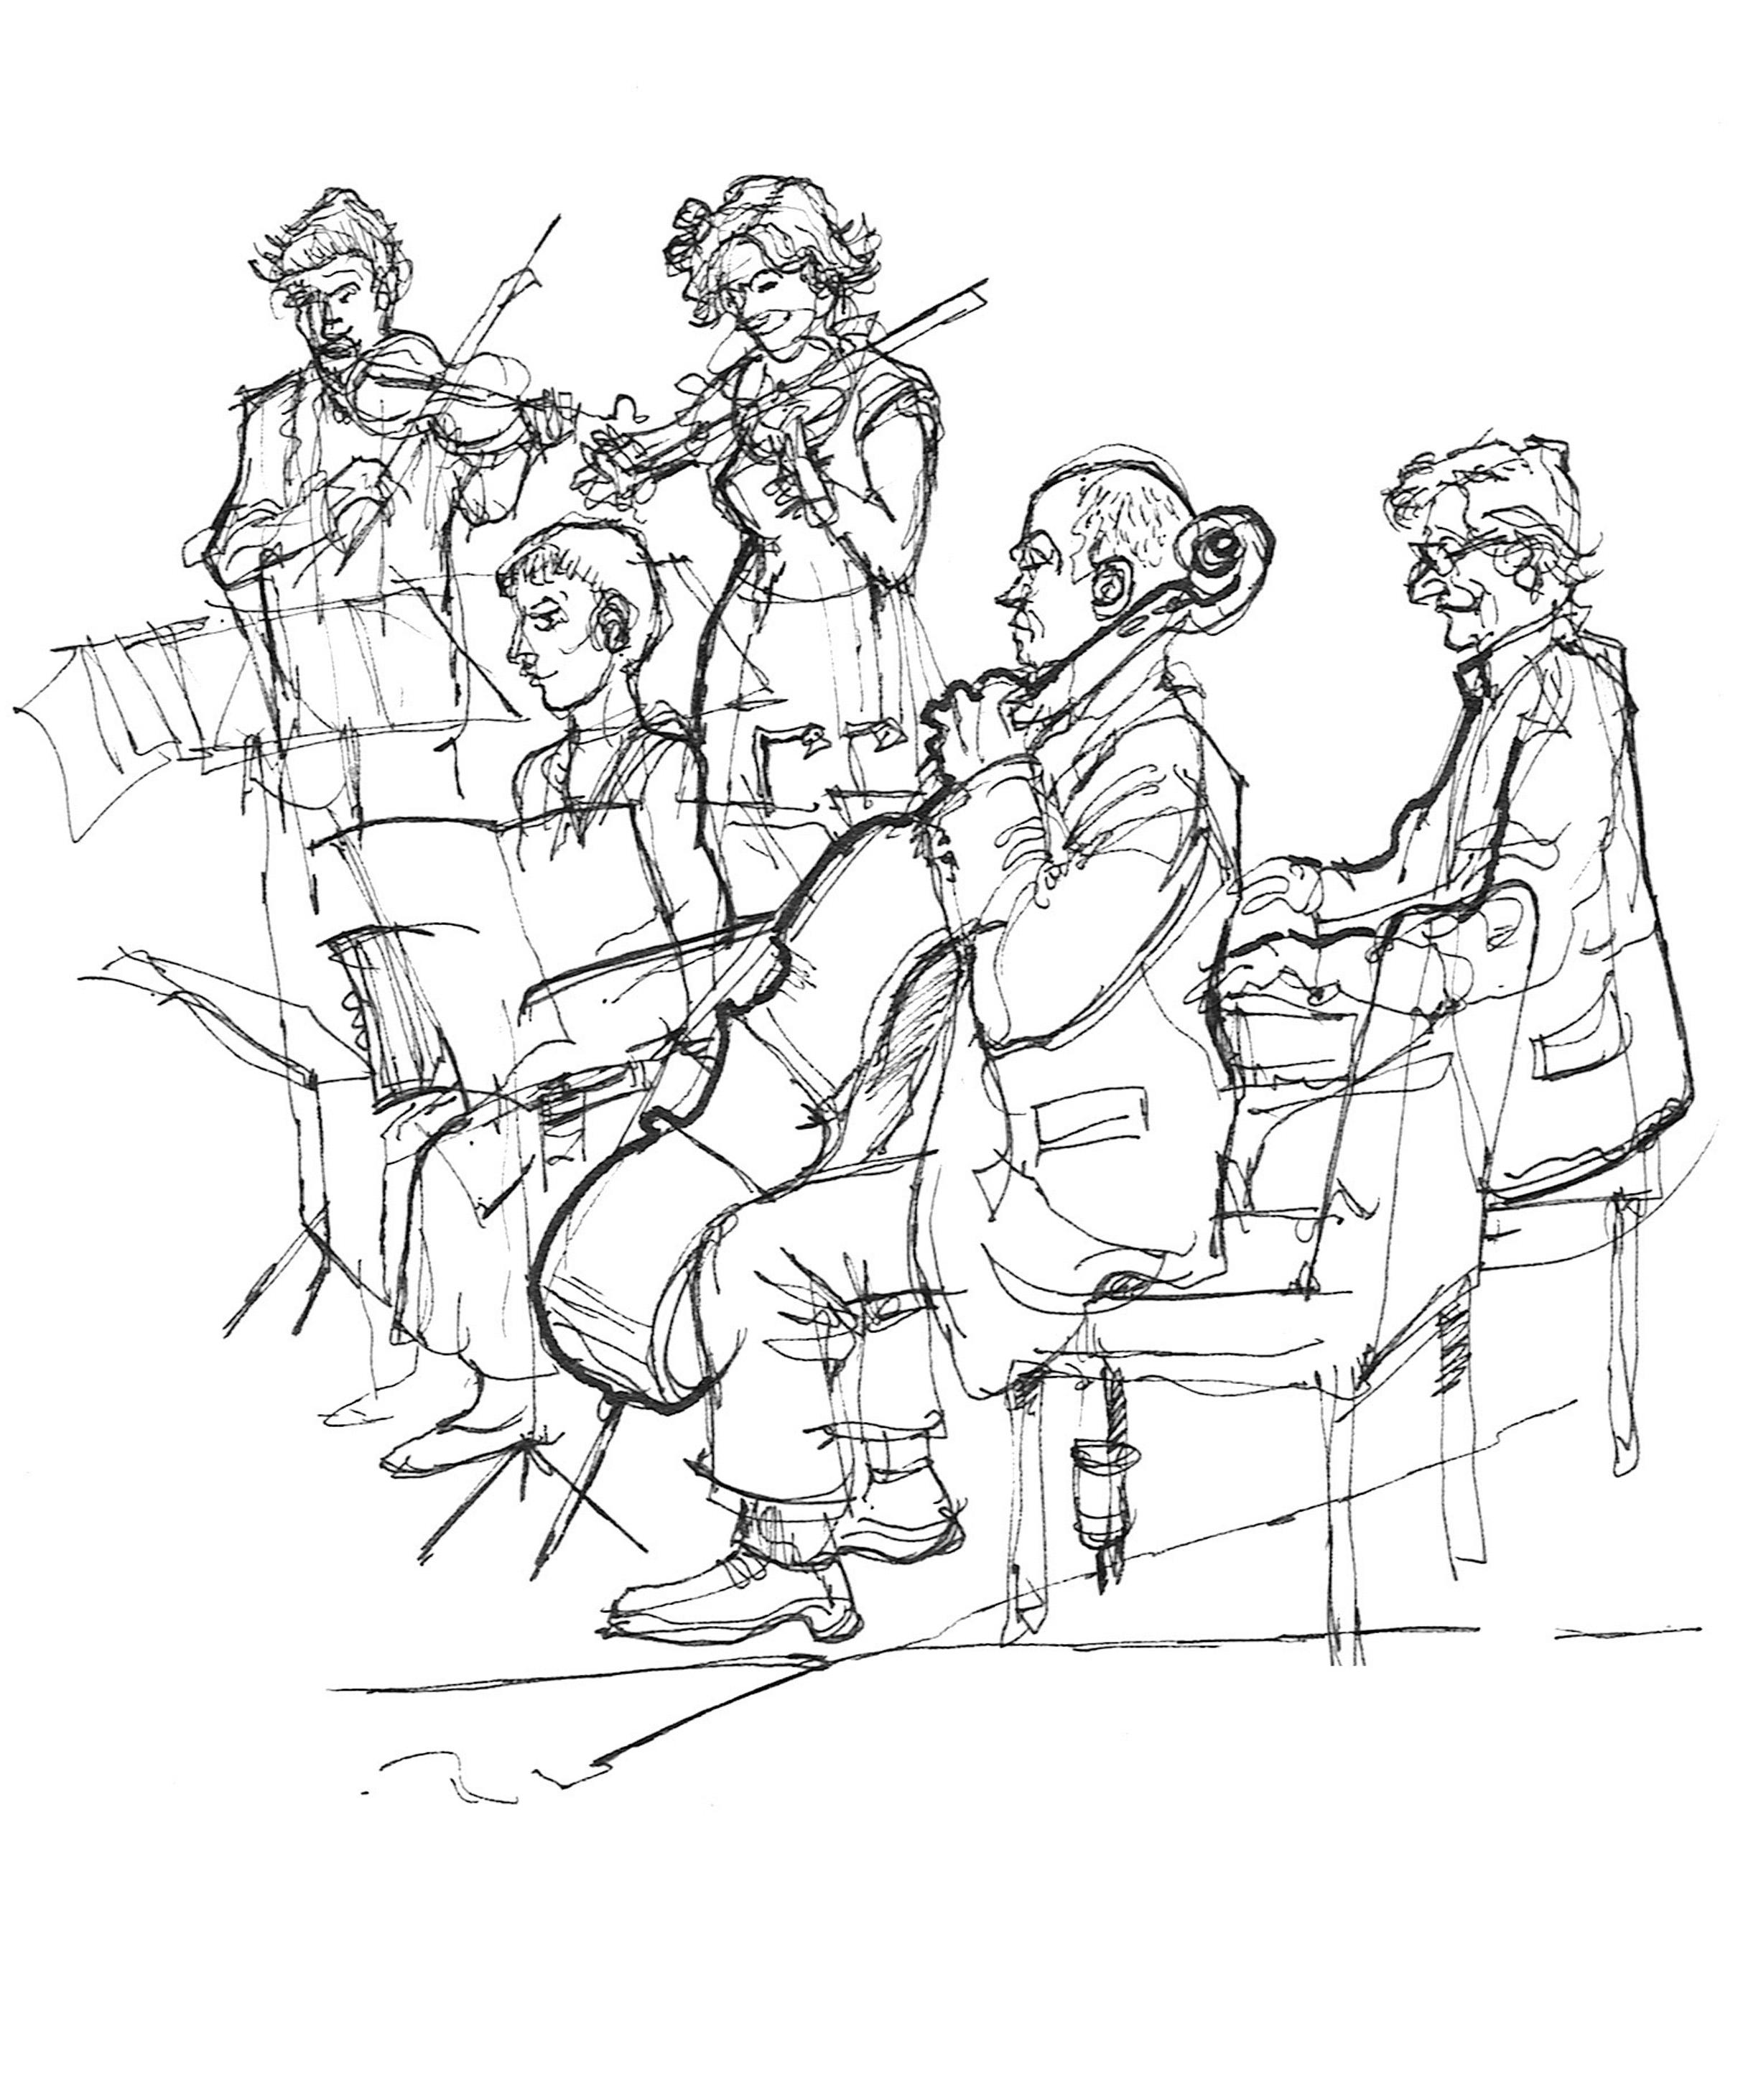 Dai's Reportage : Drawing bands & varied musicians